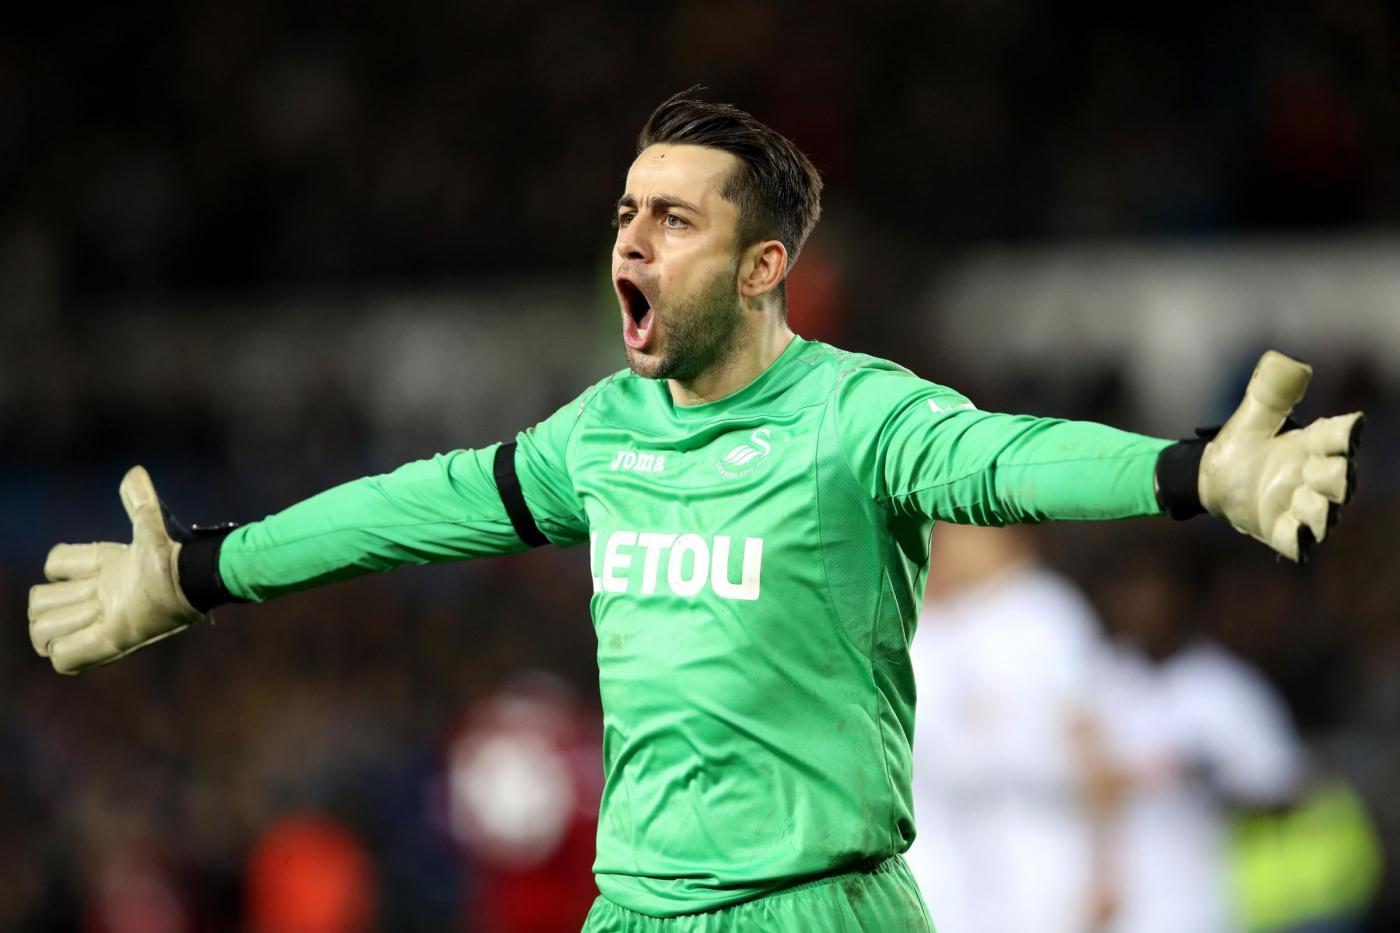 Sheffield Wed-Swansea 17 febbraio, analisi e pronostico FA Cup